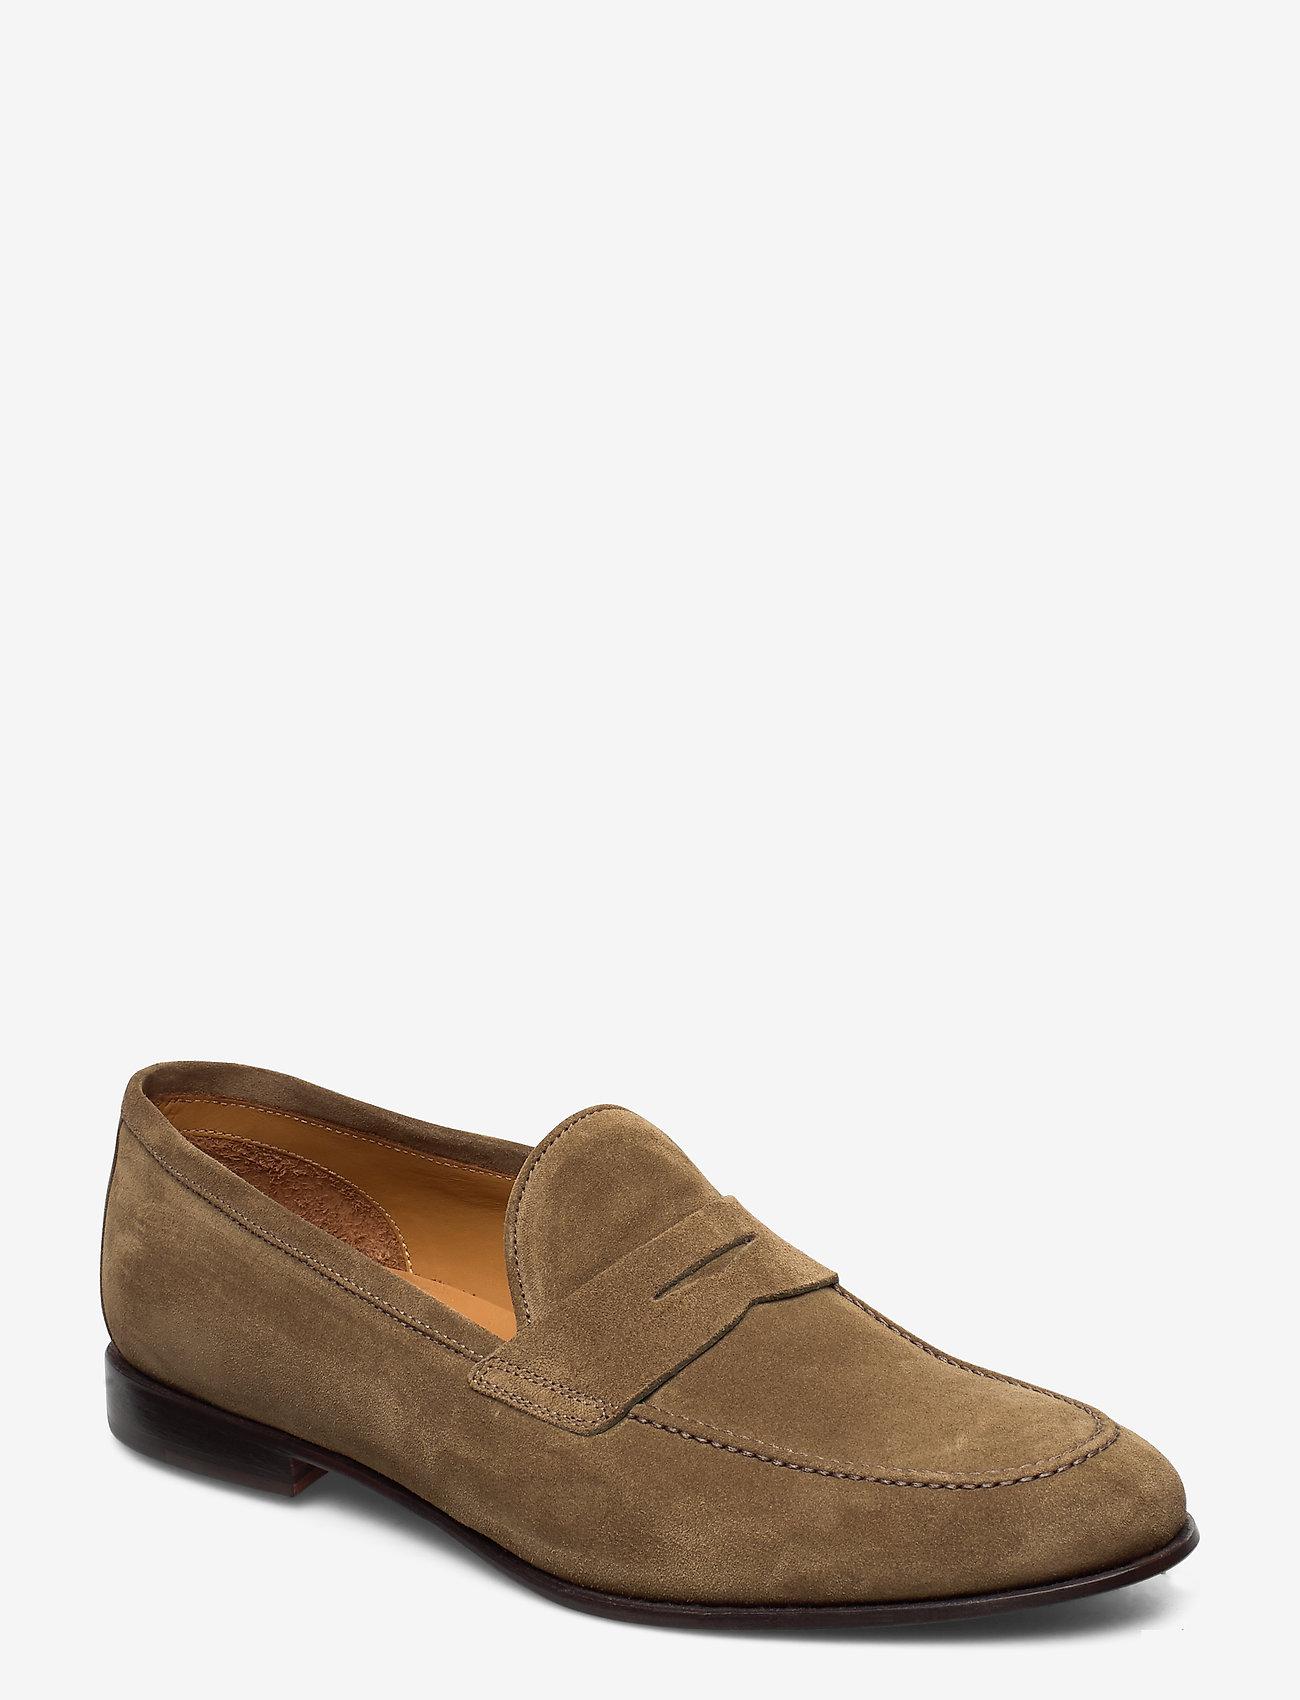 SAND - Footwear MW - F359 - loafers - light camel - 0